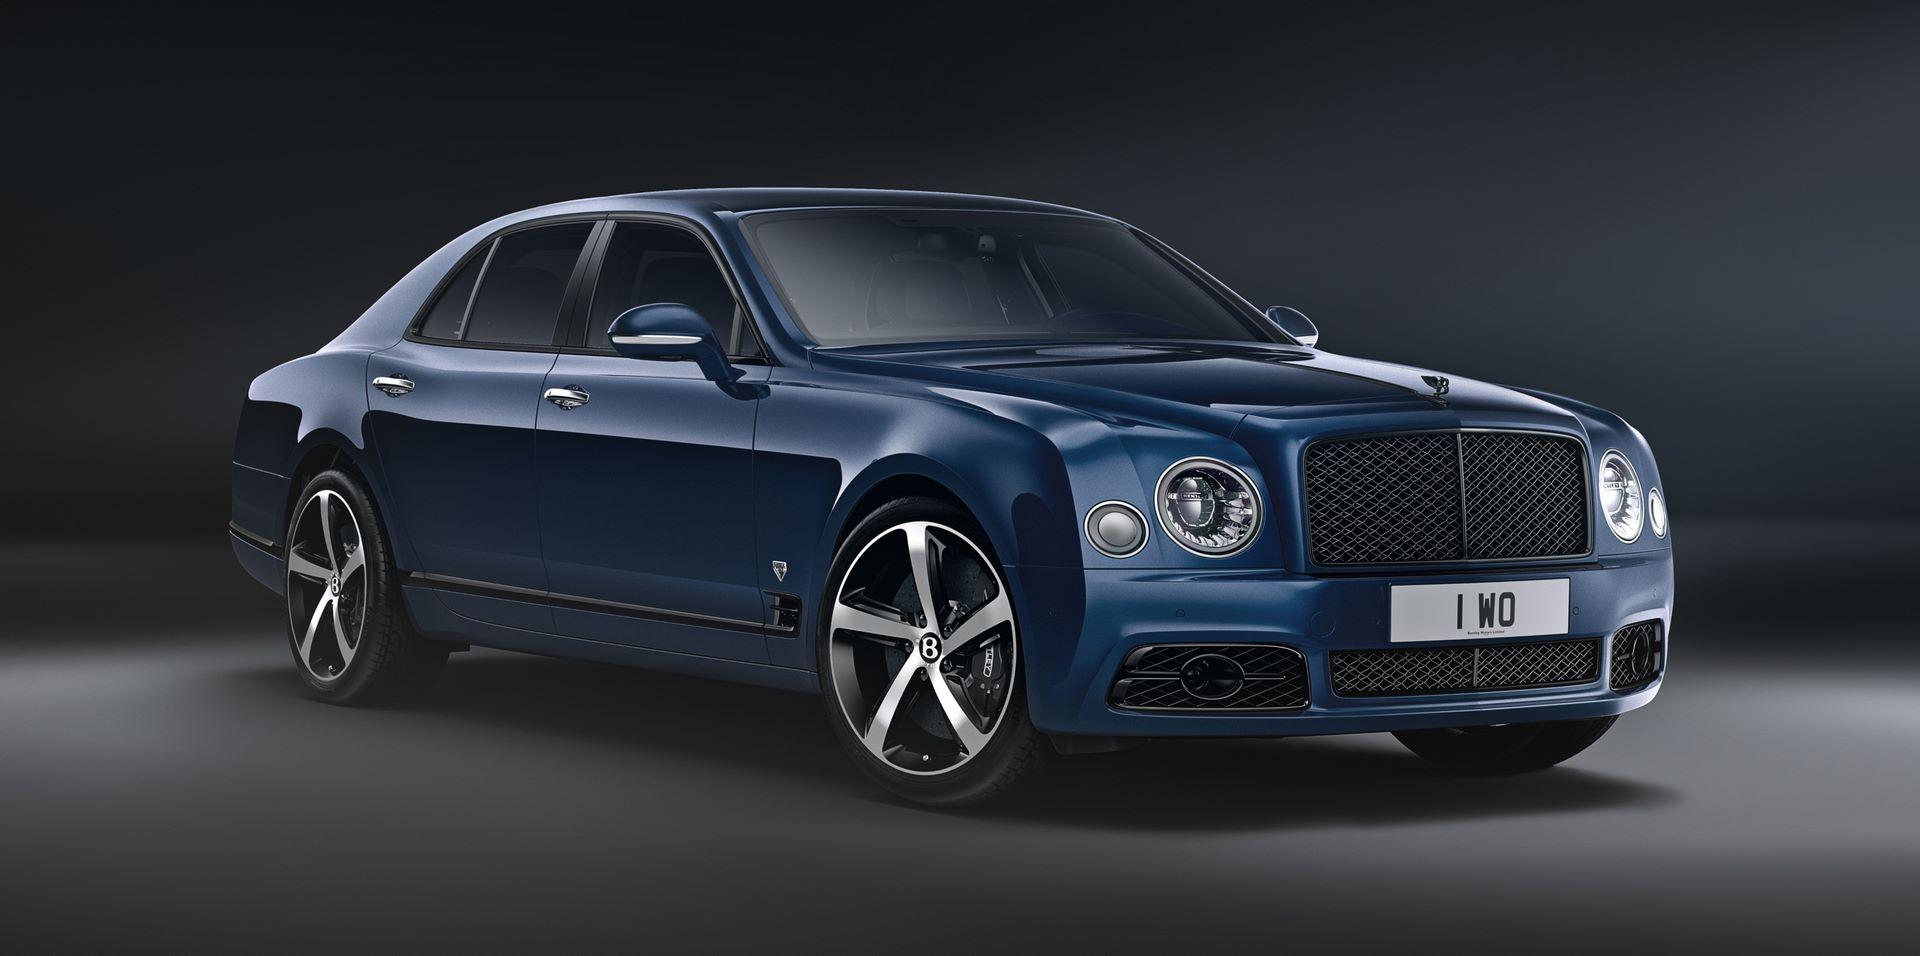 Bentley-Mulsanne-6.75-Edition-By-Mulliner-2